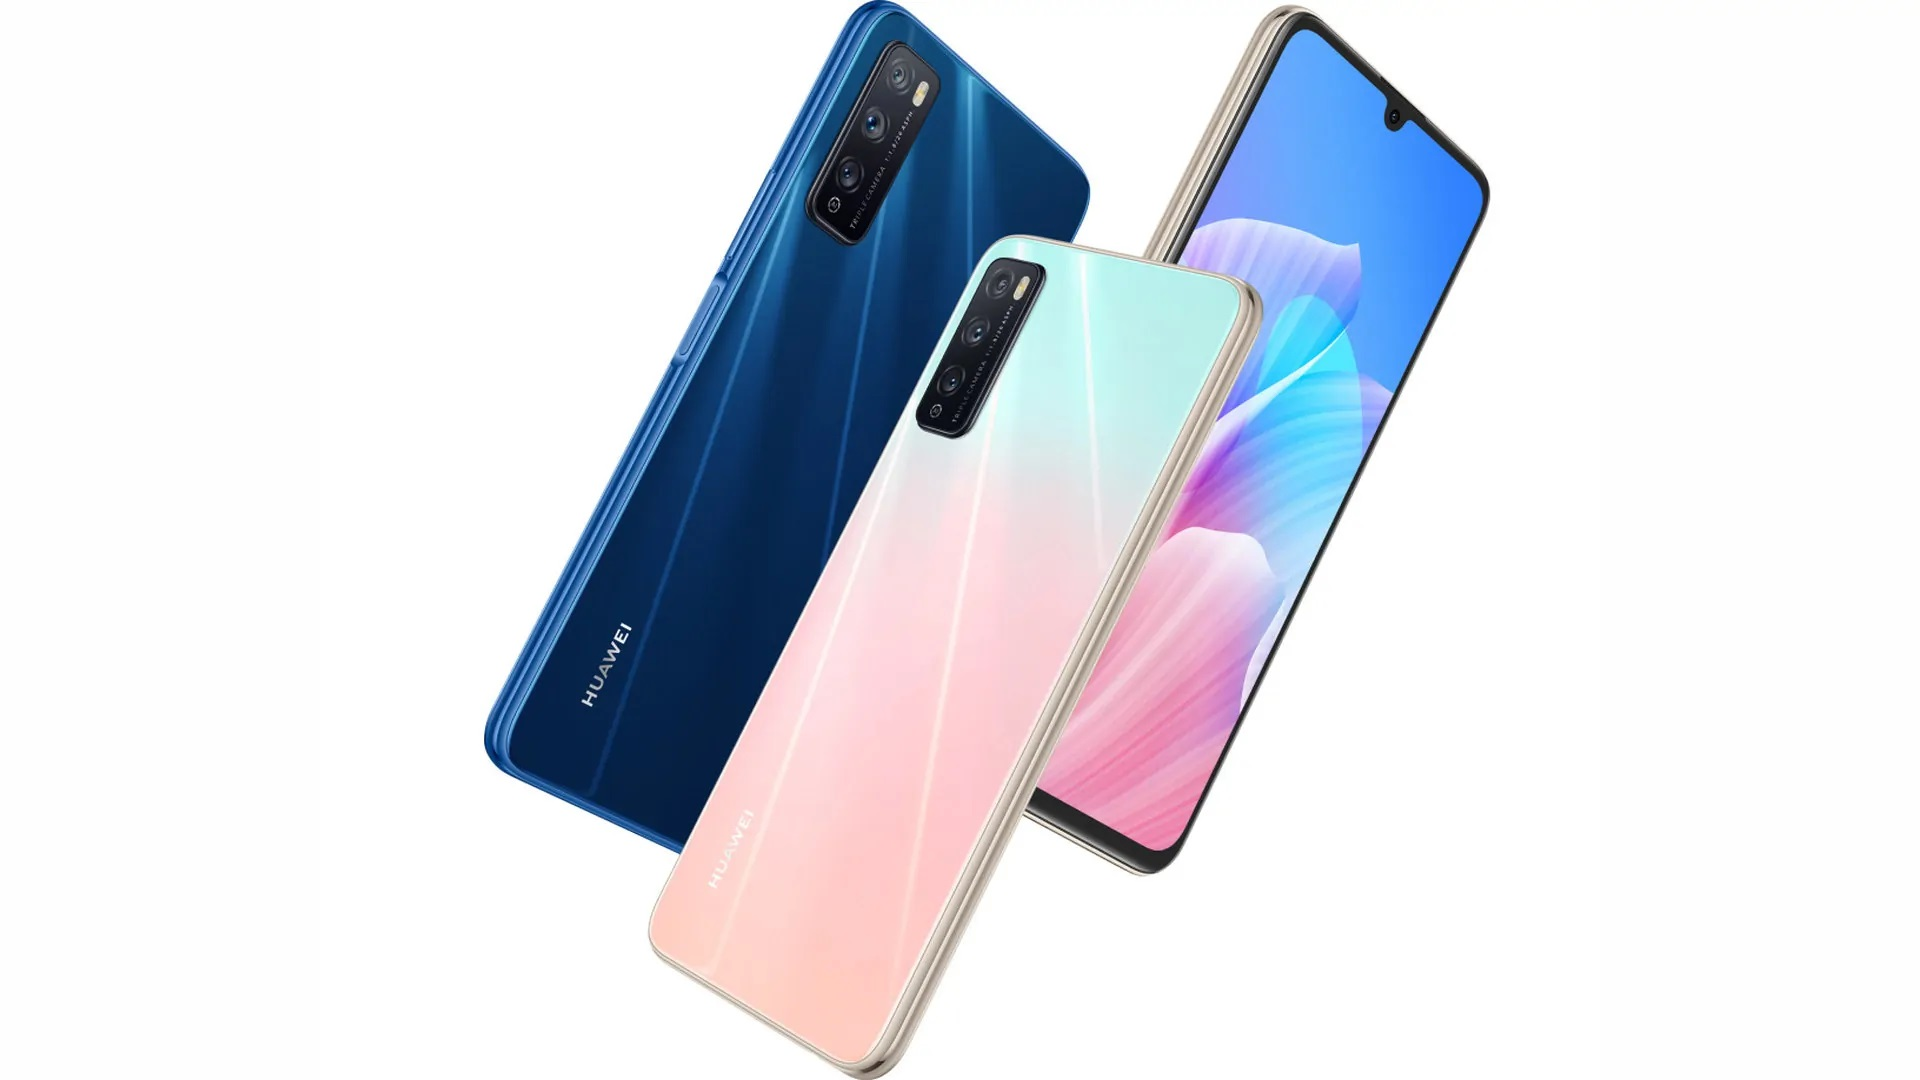 مراجعة مواصفات موبايل Huawei الجديد Huawei Enjoy 20 Pro